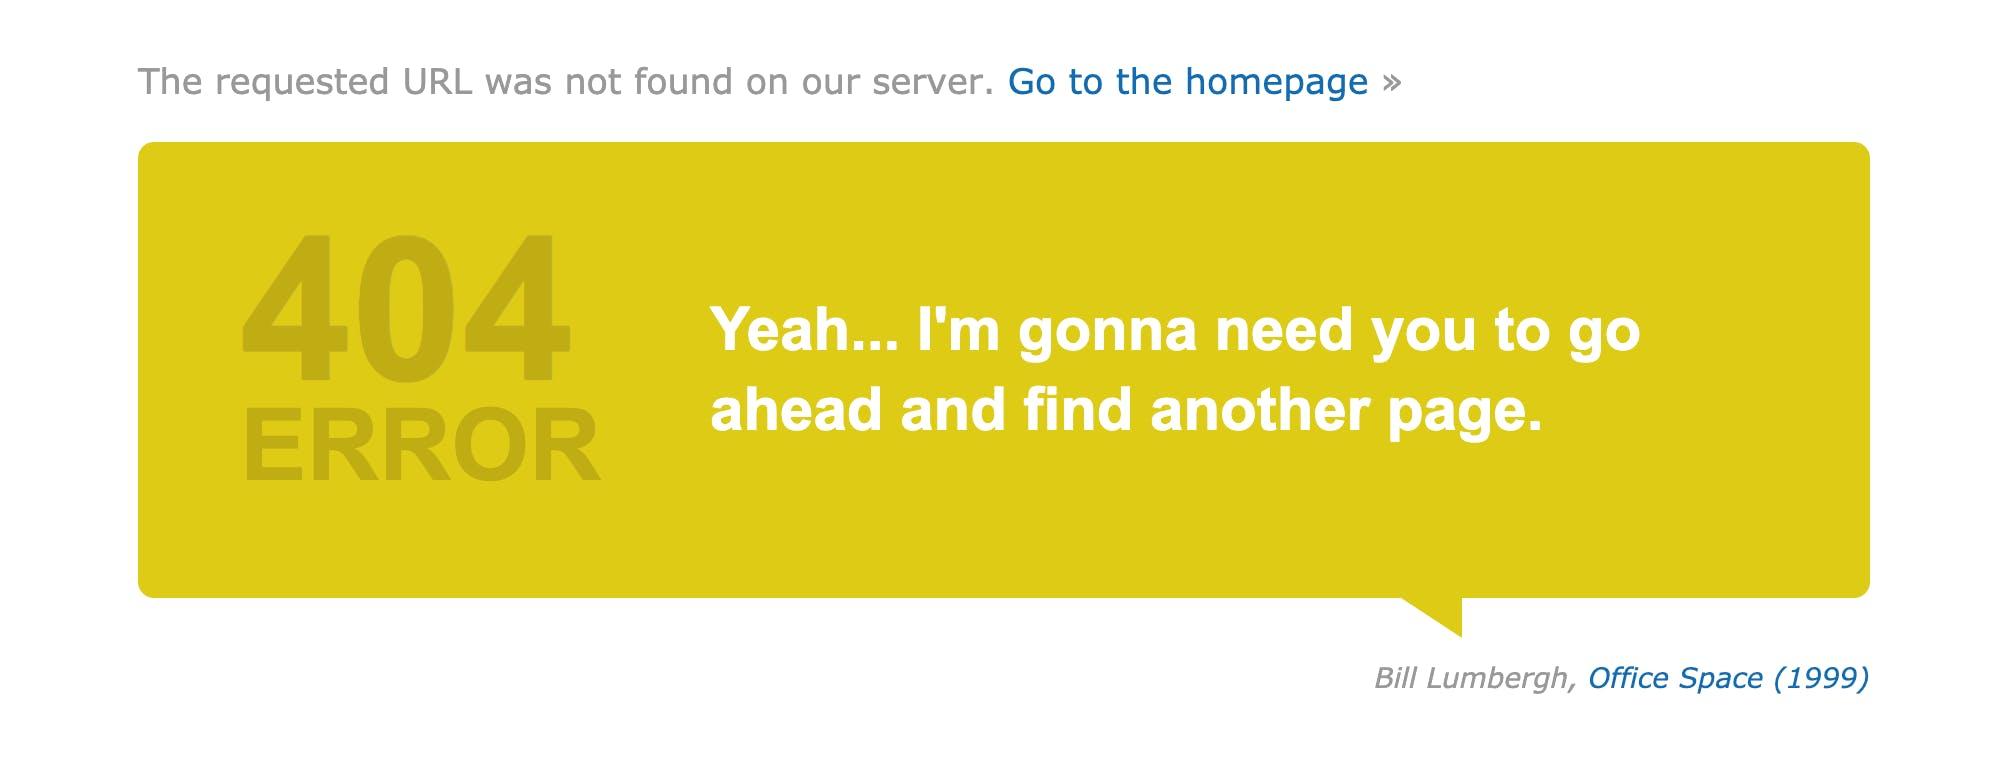 imdb 404 page